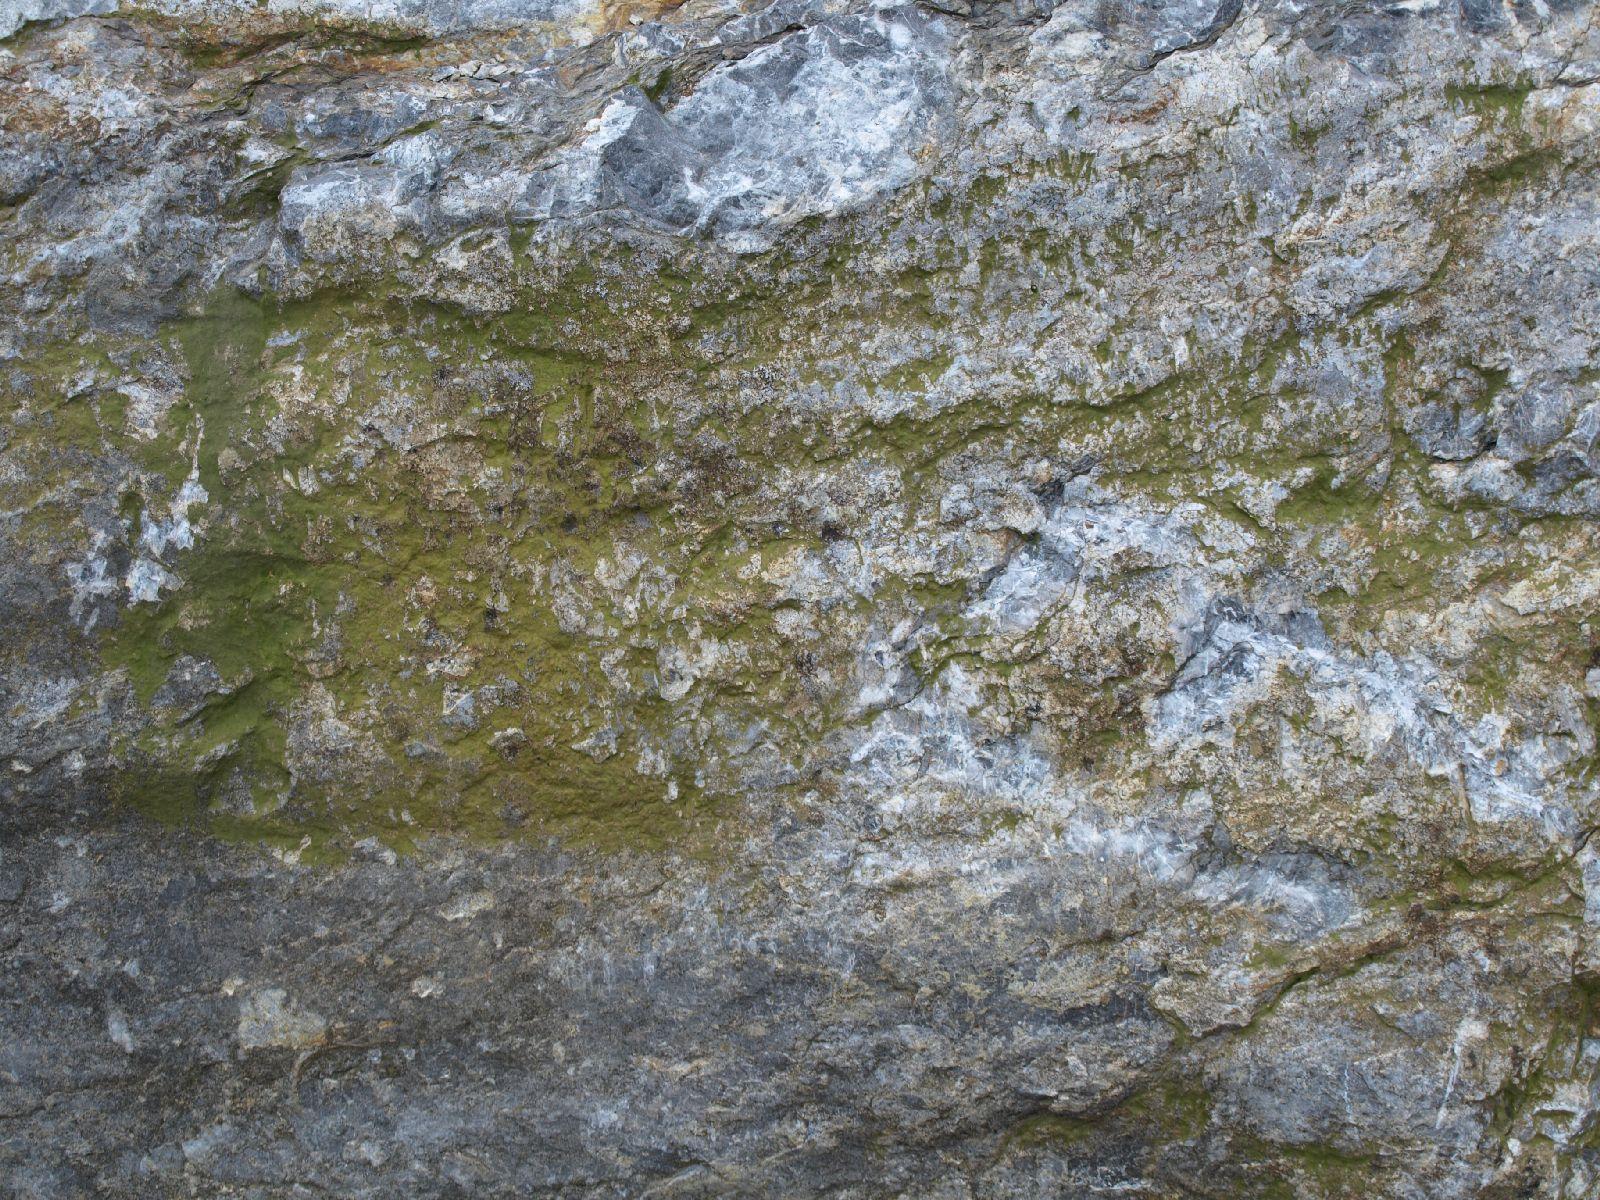 Stein-Felsen_Textur_A_PB026416